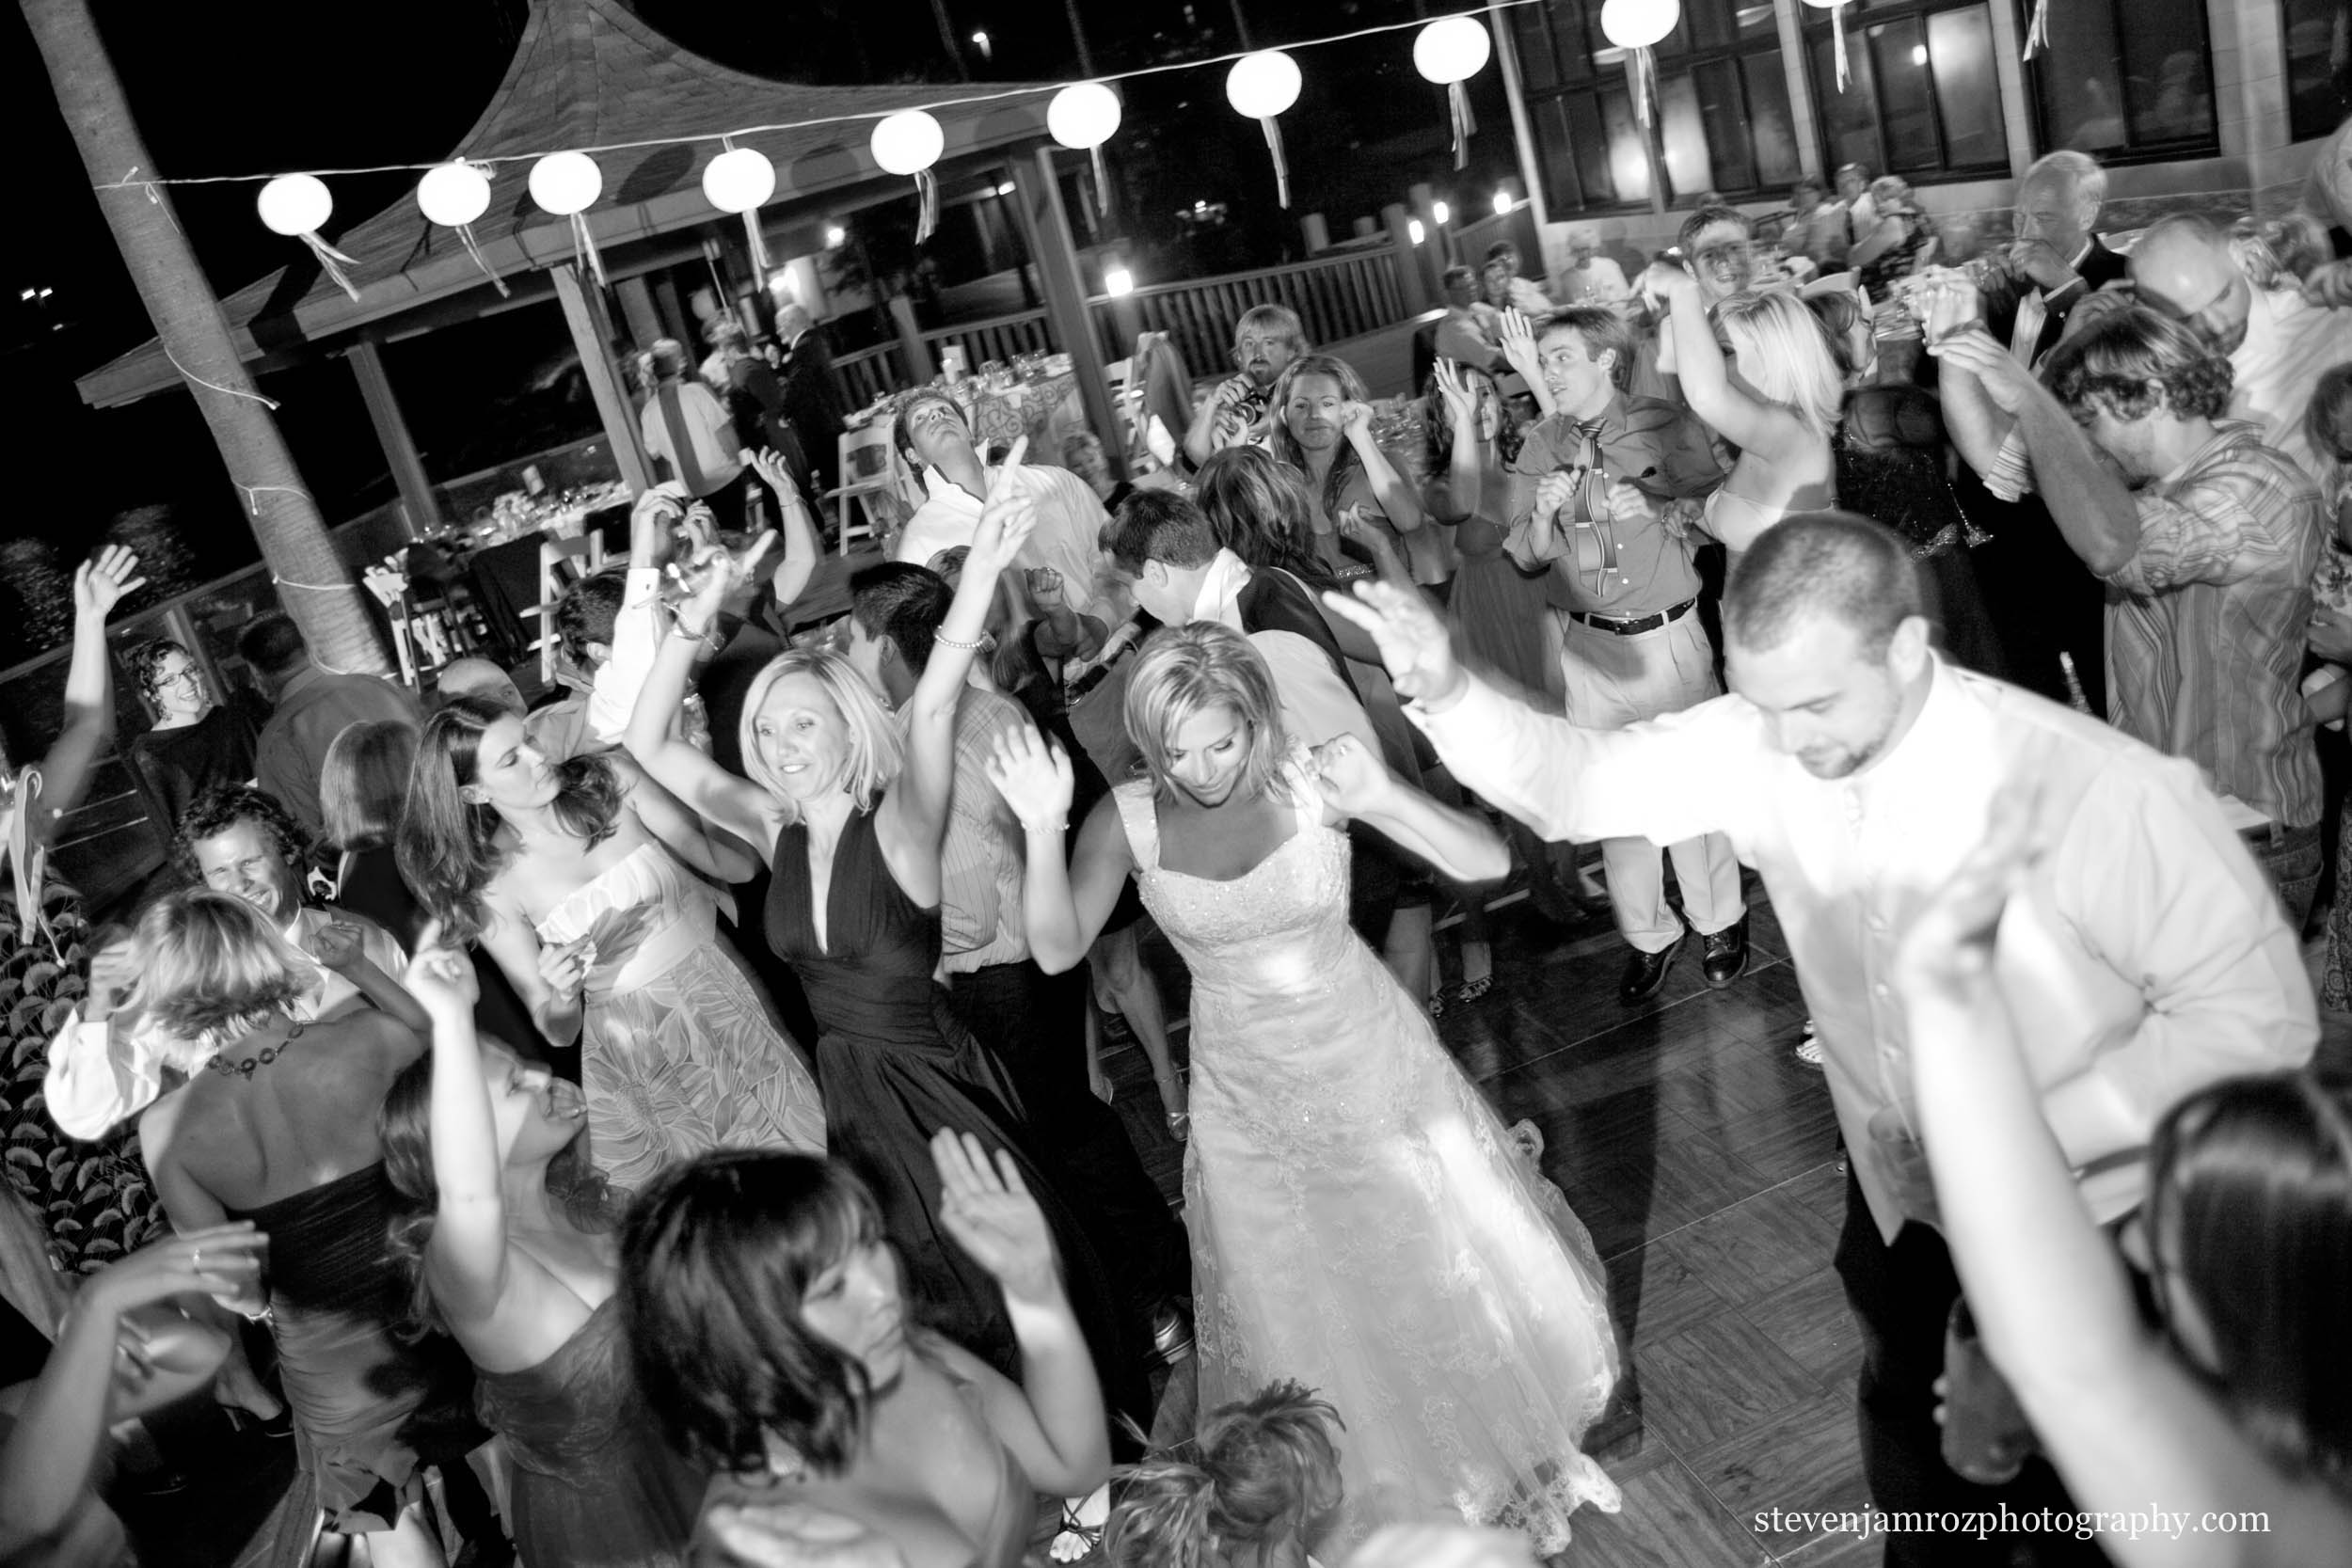 large-wedding-reception-party-steven-jamroz-photography-0513.jpg